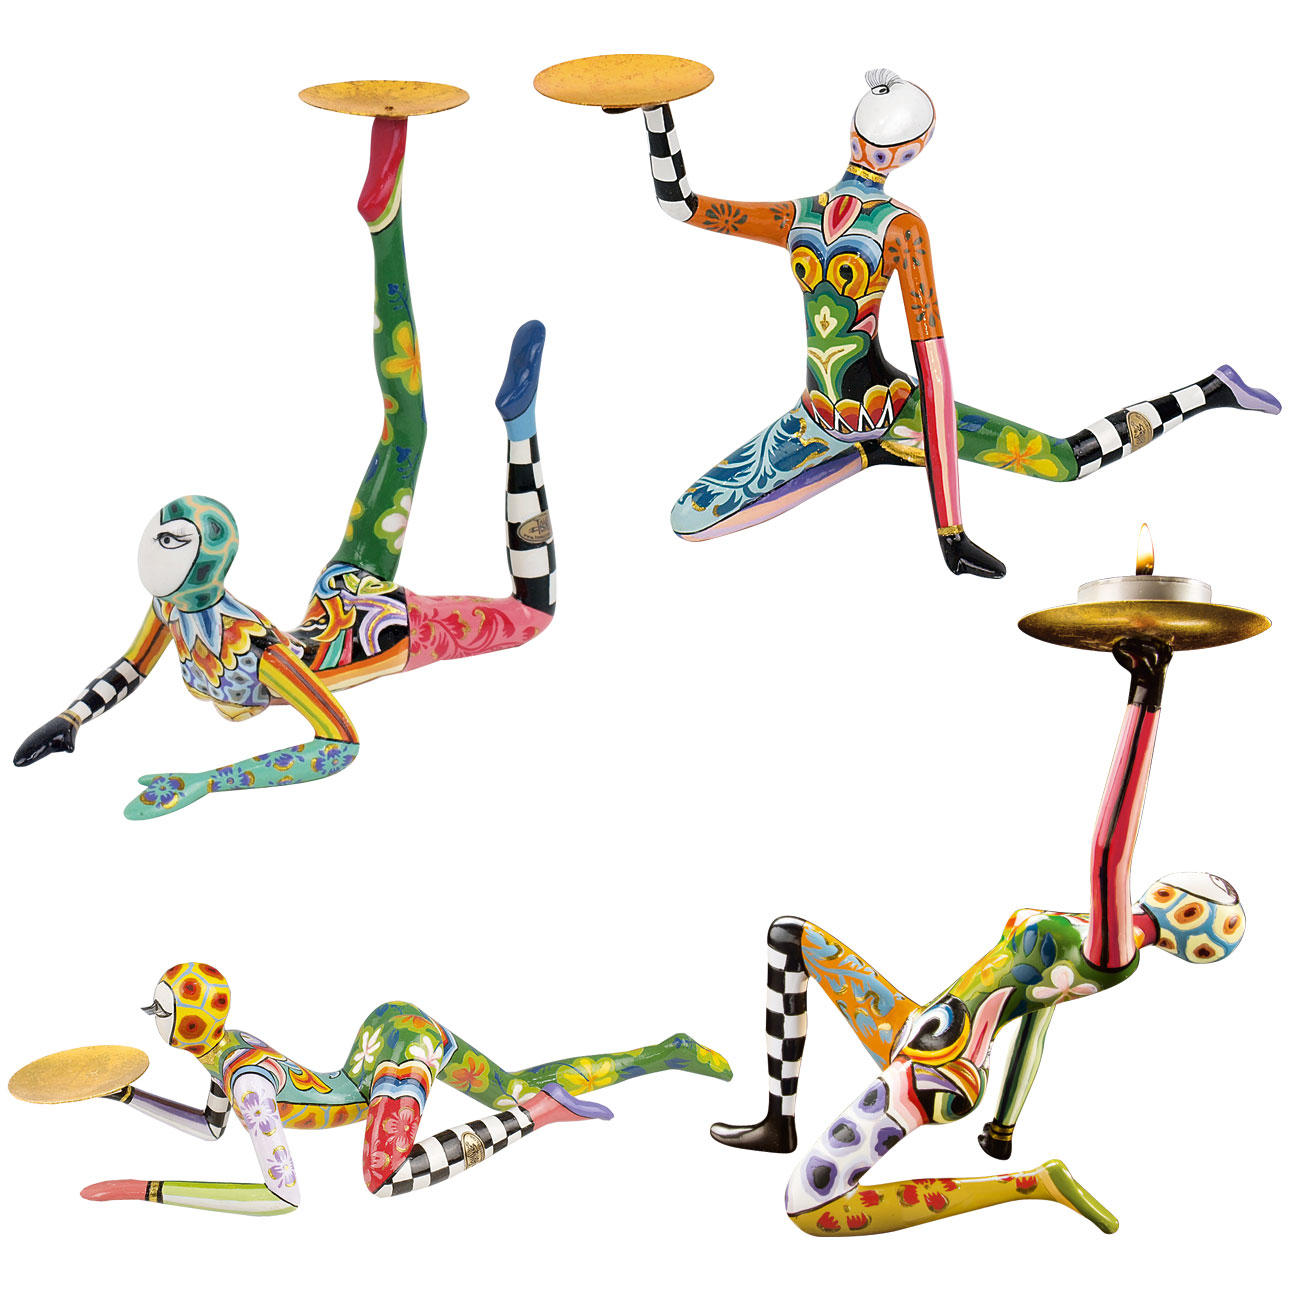 "Tom's Skulpturen Tom's Acrobat 4er-SetHandbemalte Skulpturen ""Circus Collection"" Teelichthalter Marmorin :: Rot/Grün/Blau/Gelb/Bunt -  -  - Erwachsene"